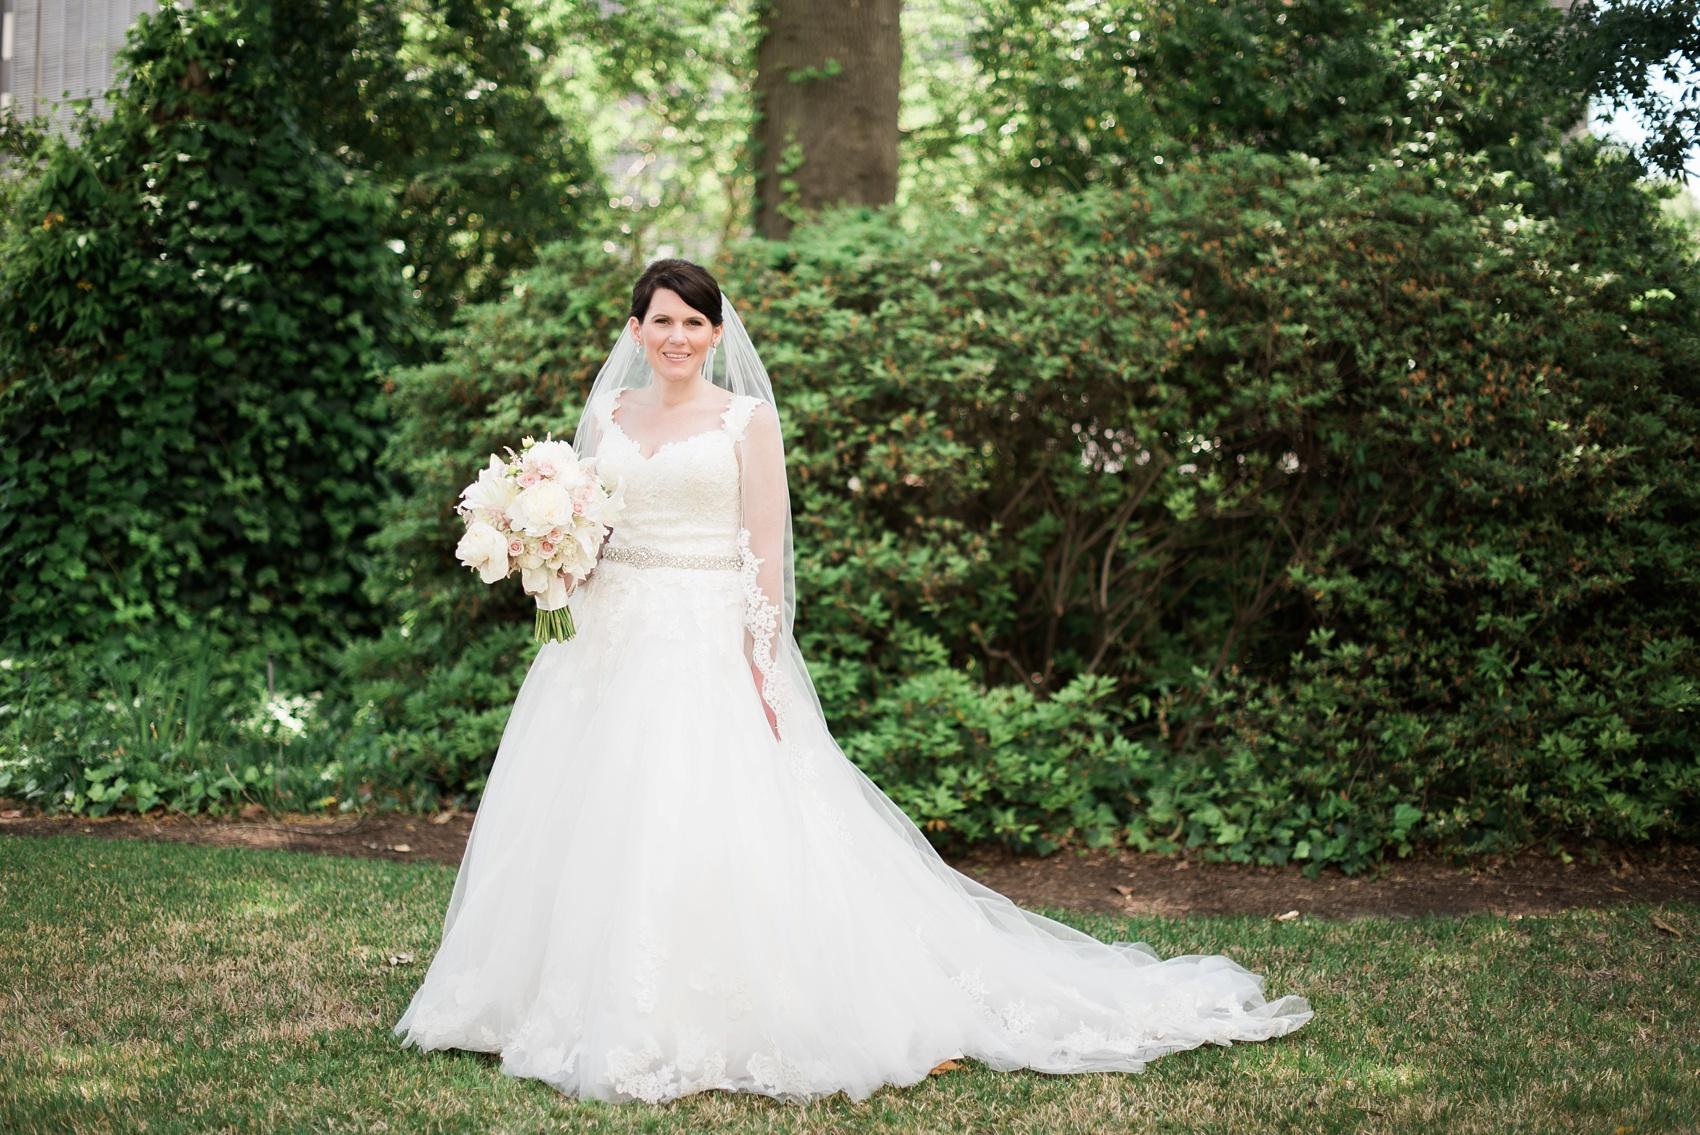 augusta_wedding_photographer_0034.jpg